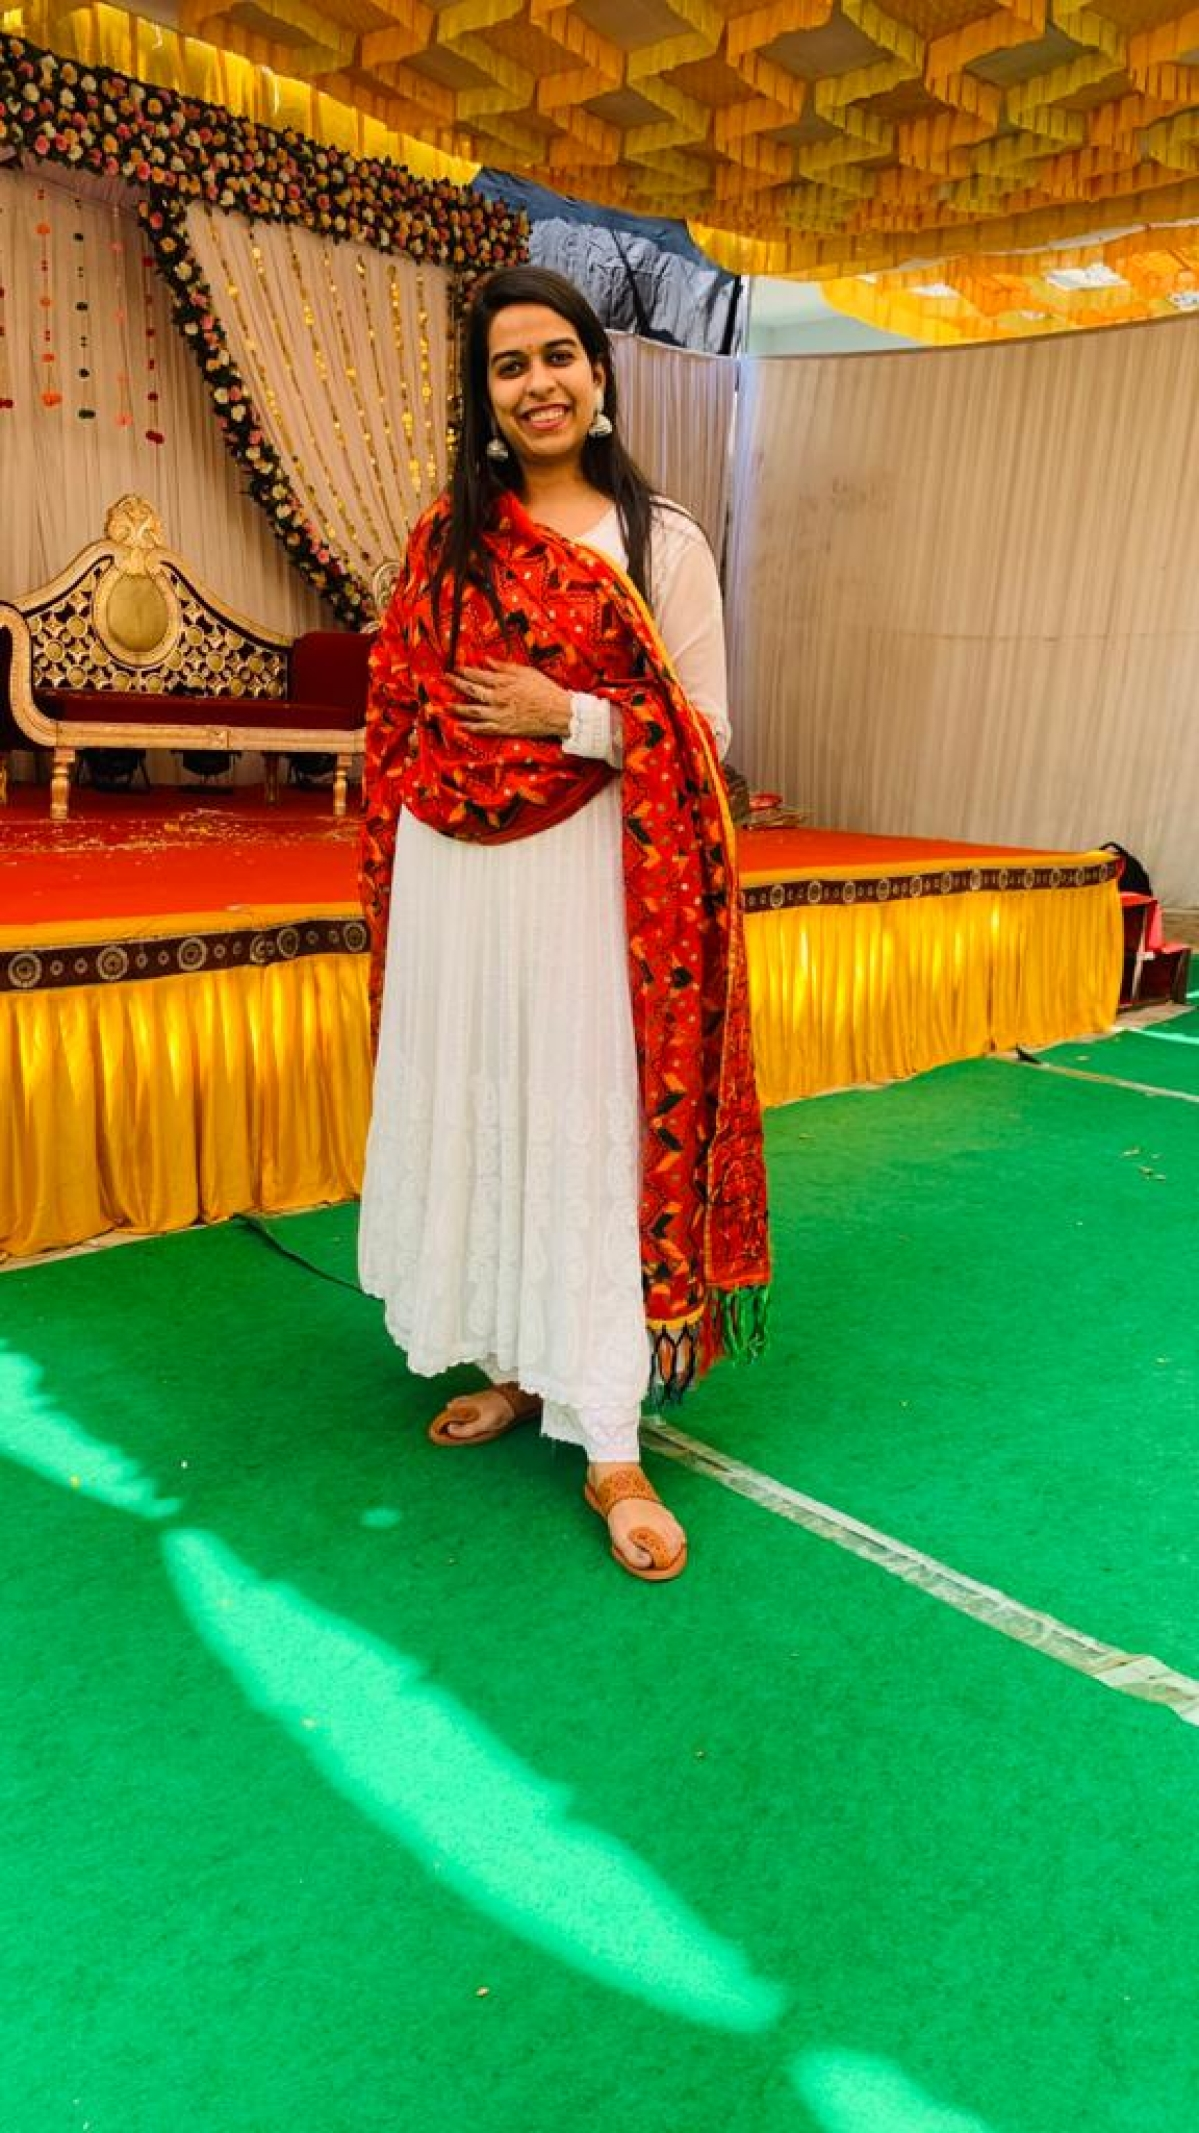 Gauri Chaturvedi